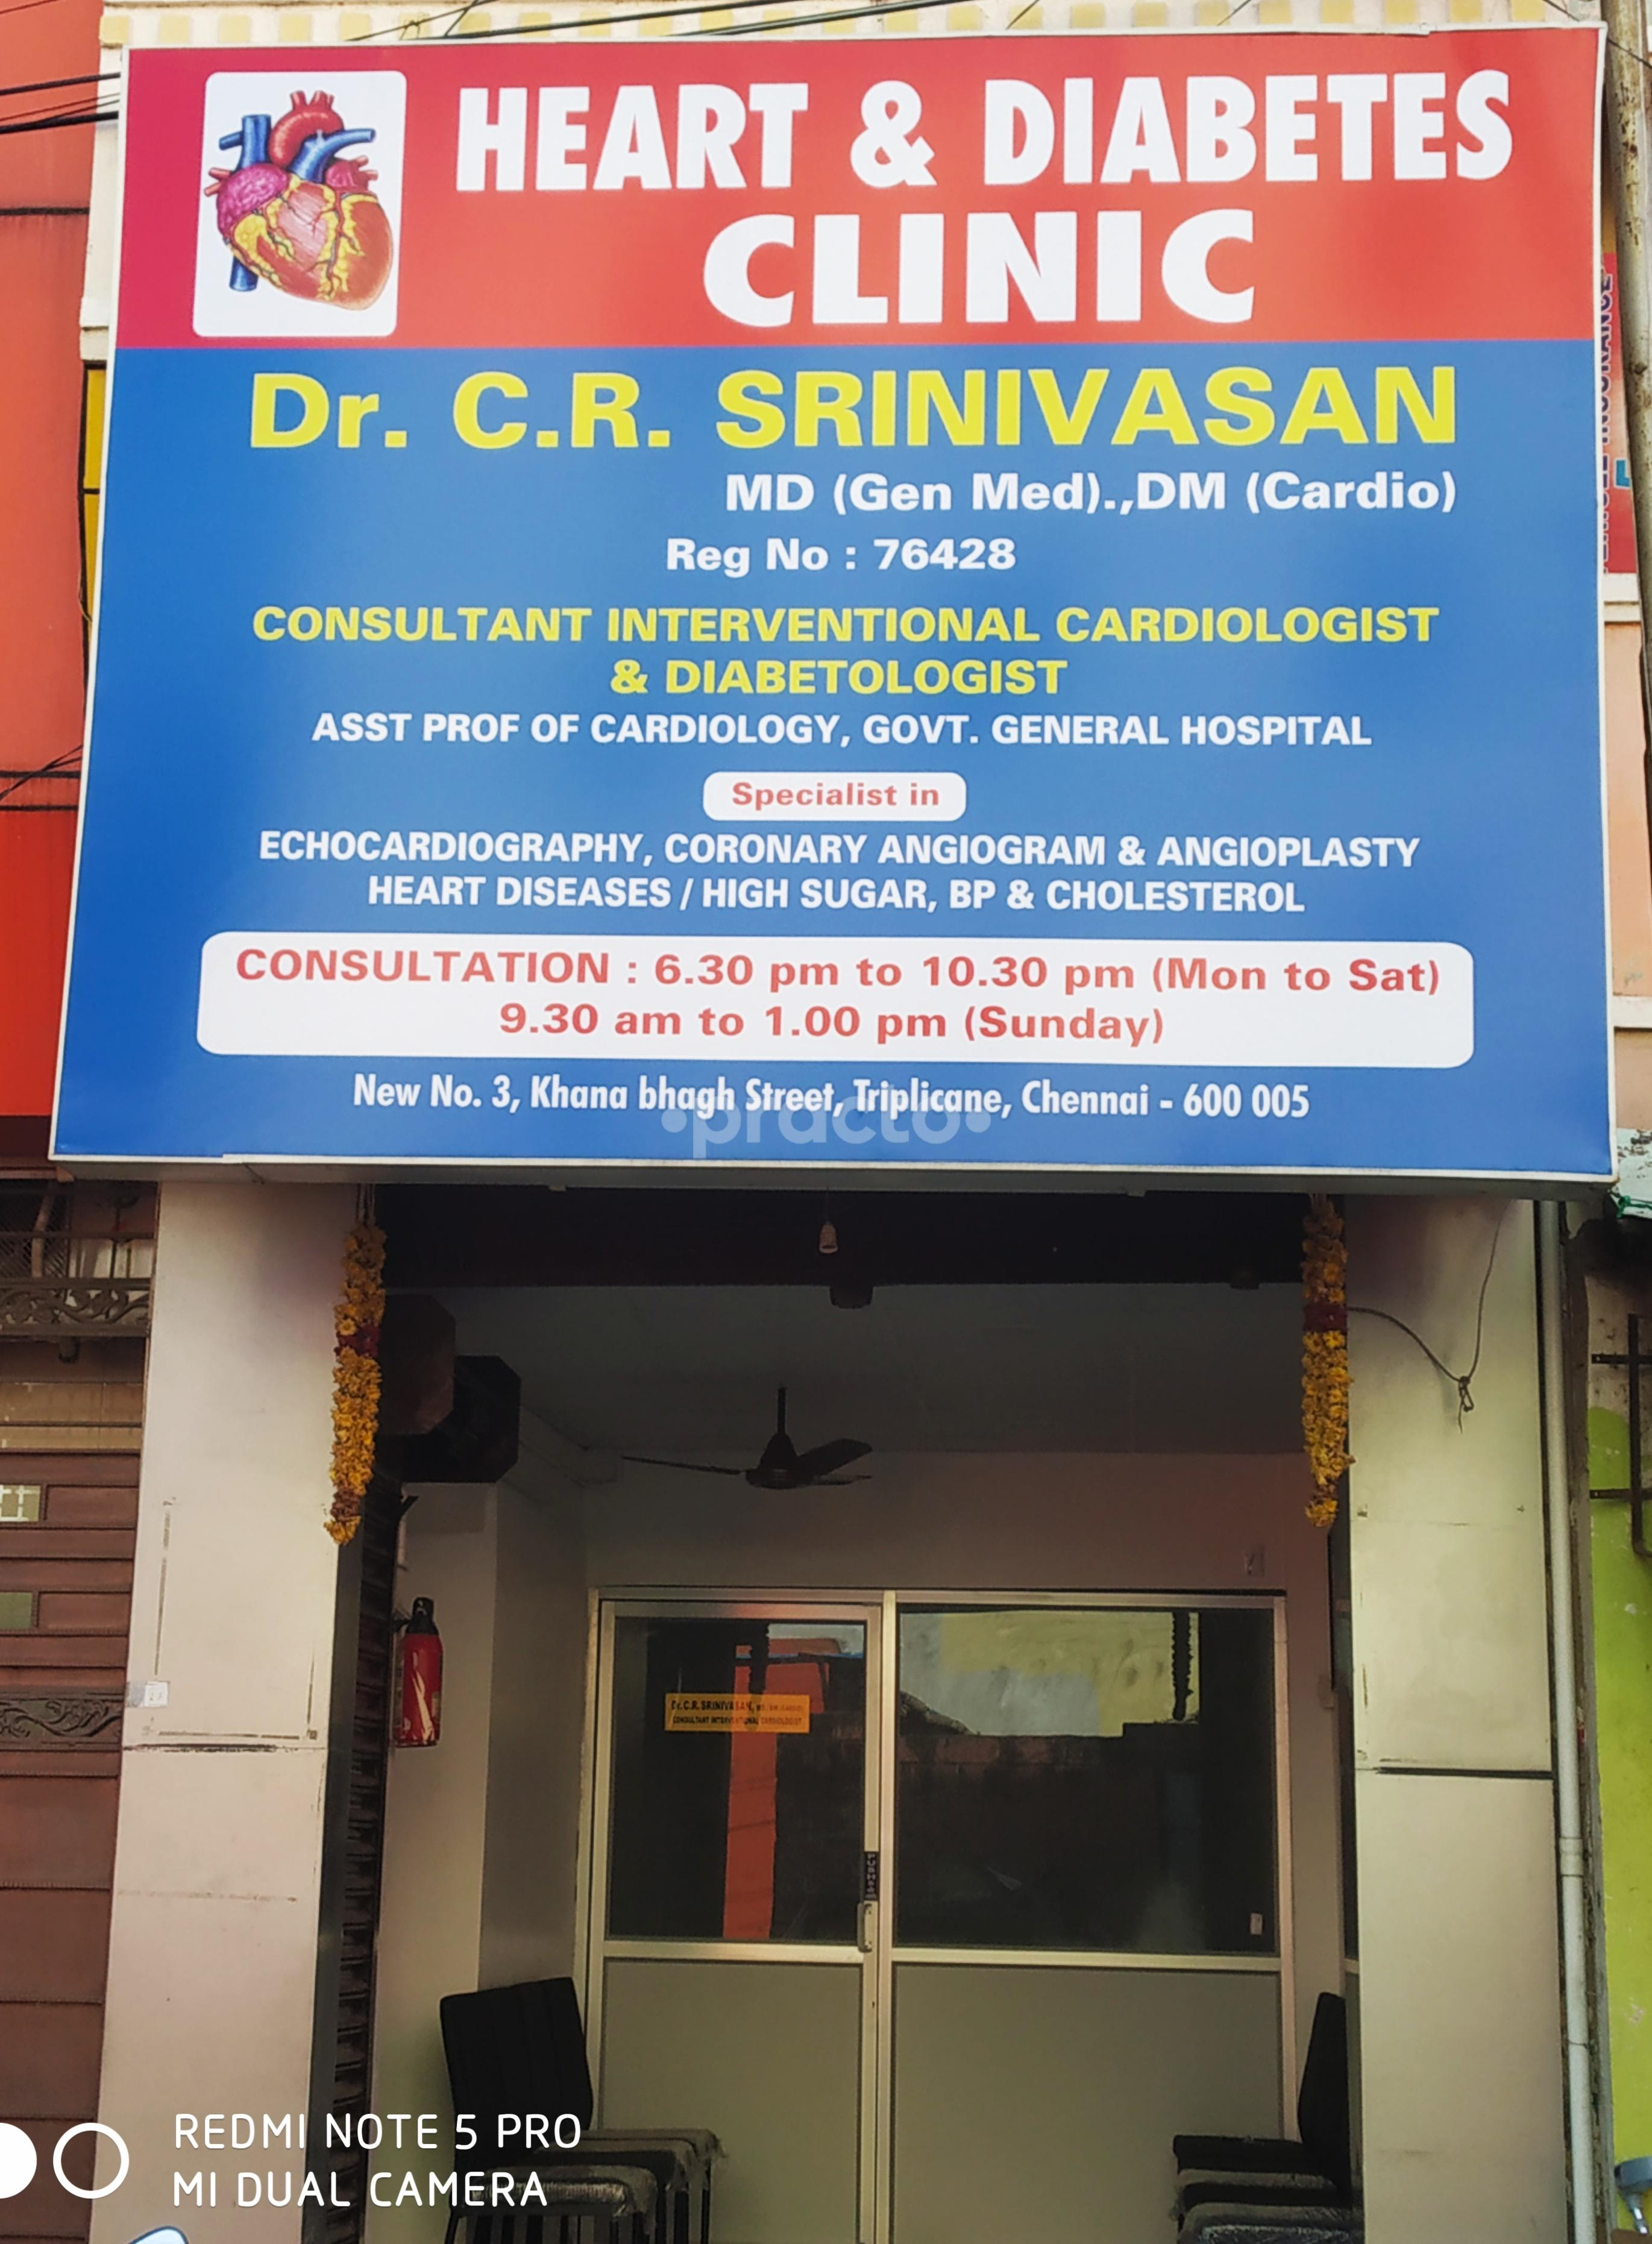 Best Interventional Cardiology Clinics in Periyamet, Chennai